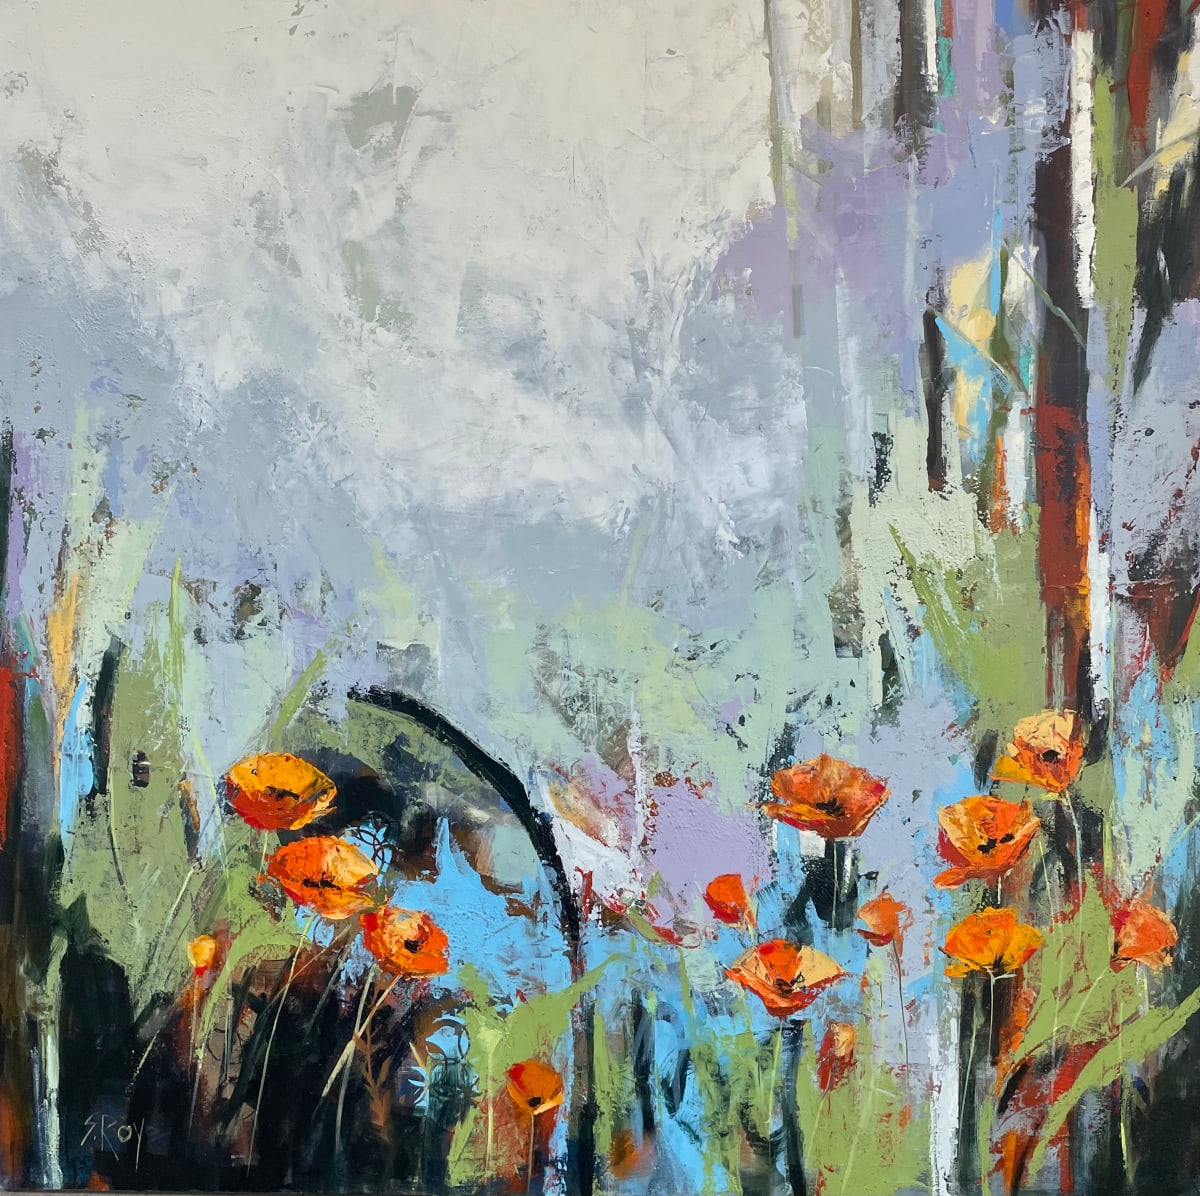 Distant Land by Sharmila Roy